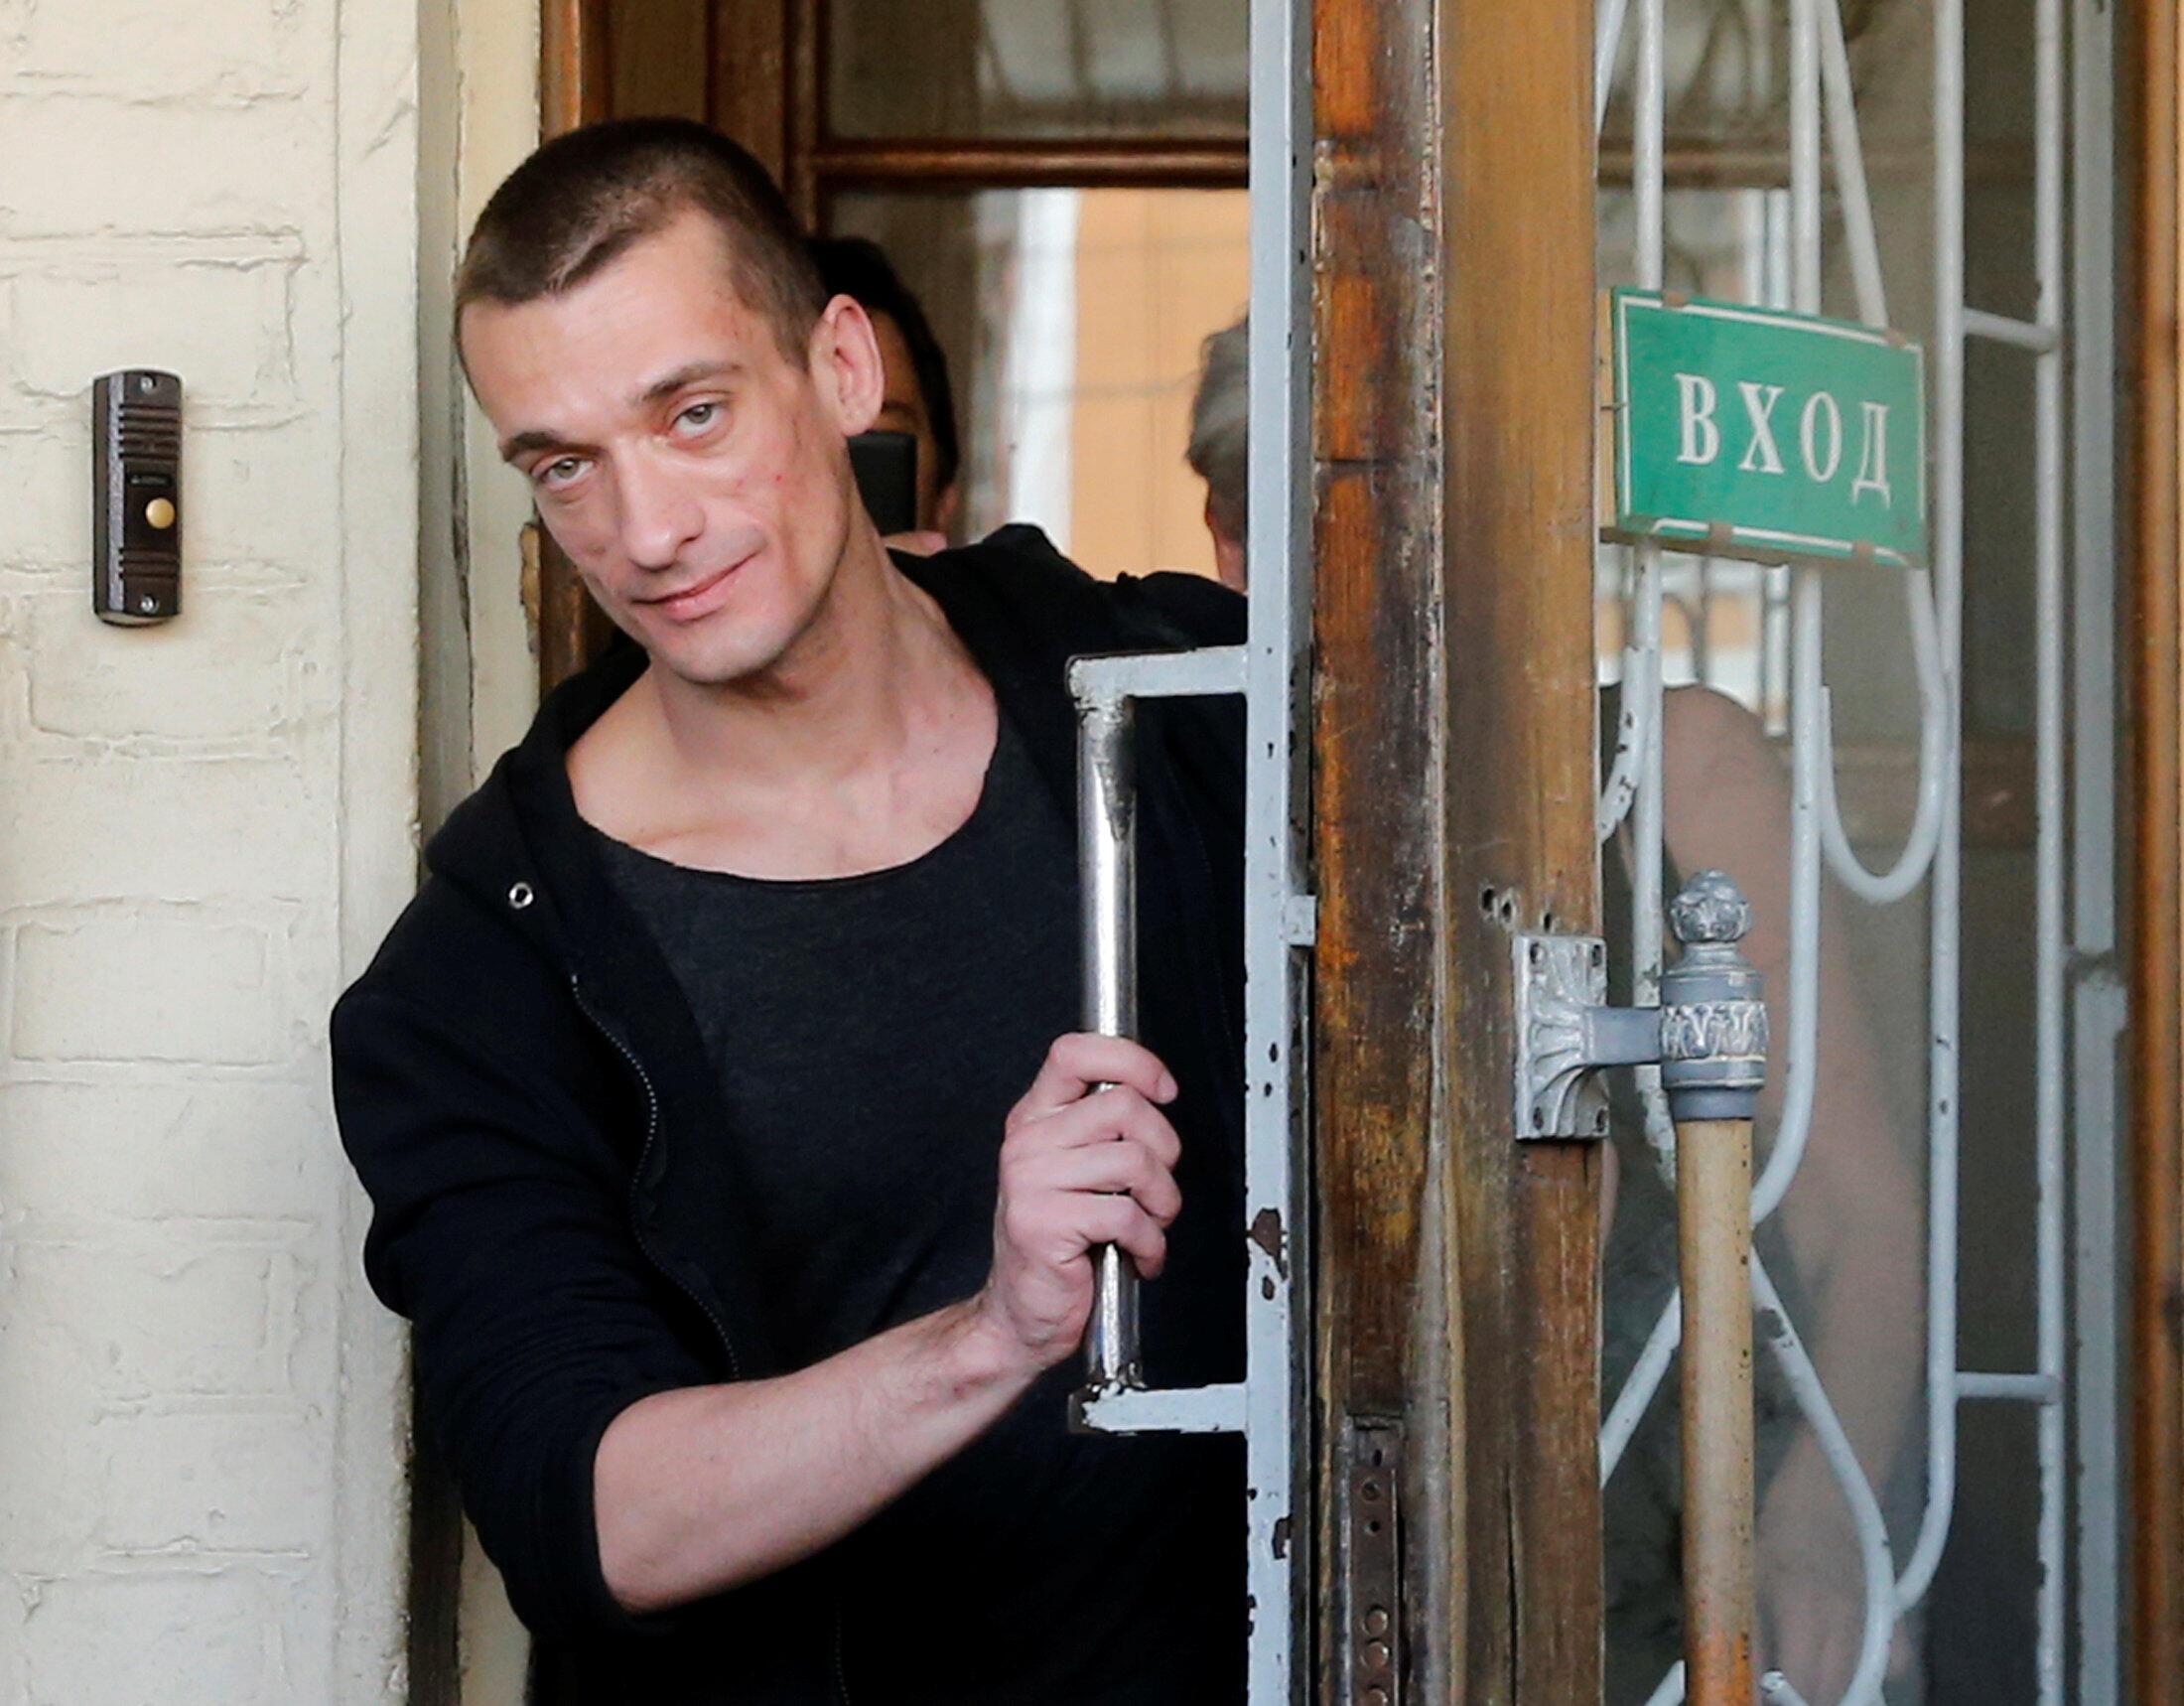 Piotr Pavlenski in Moscow, Russia, 8 June 2016.